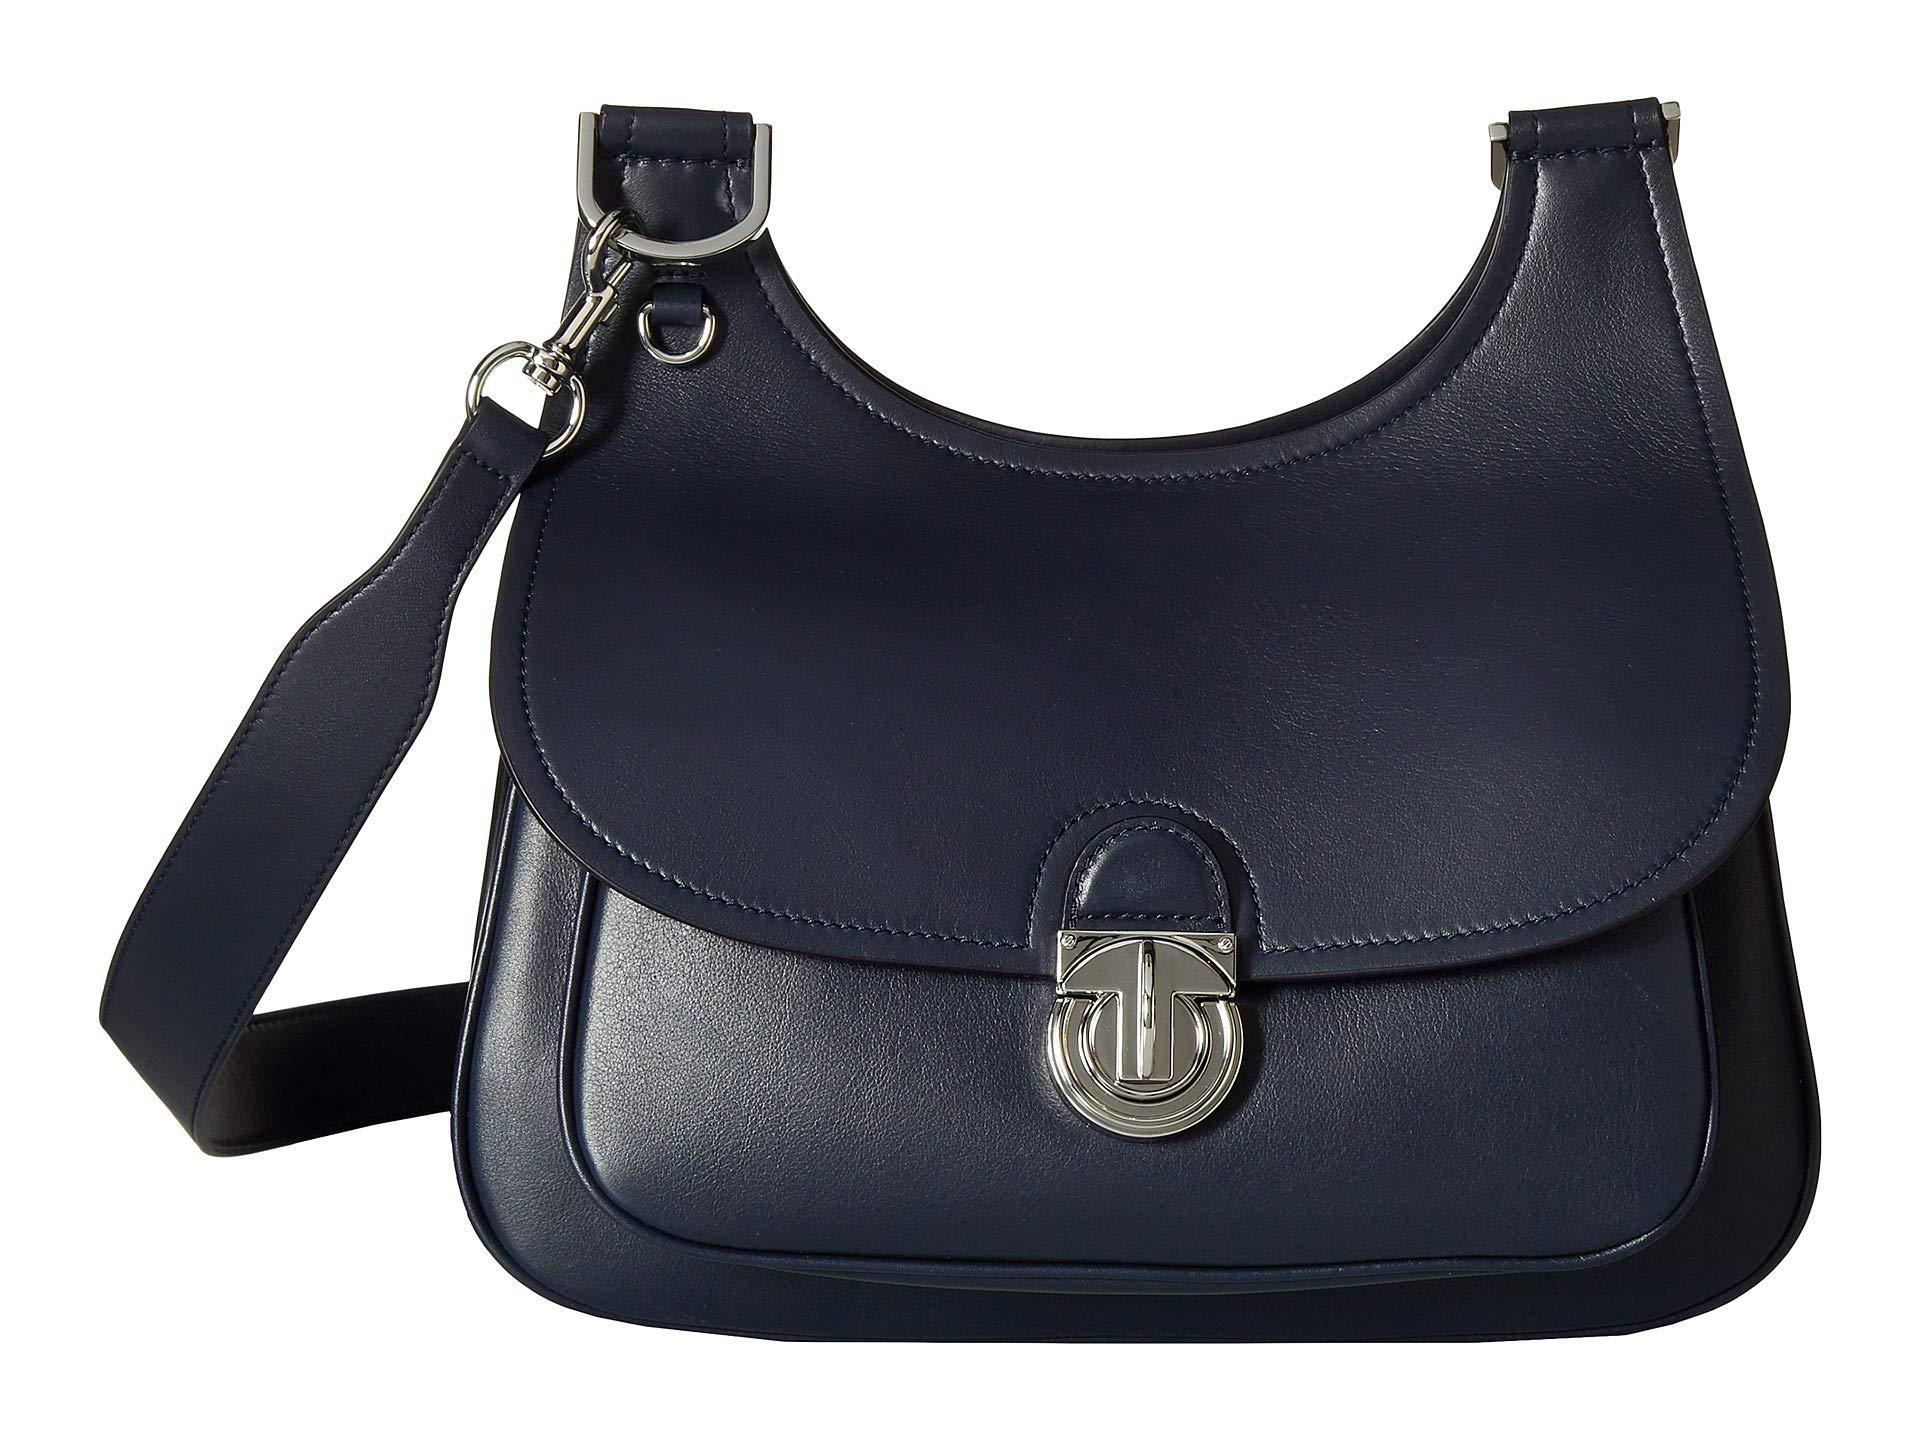 76a674467b1 Lyst - Tory Burch James Saddlebag (moose) Handbags in Blue